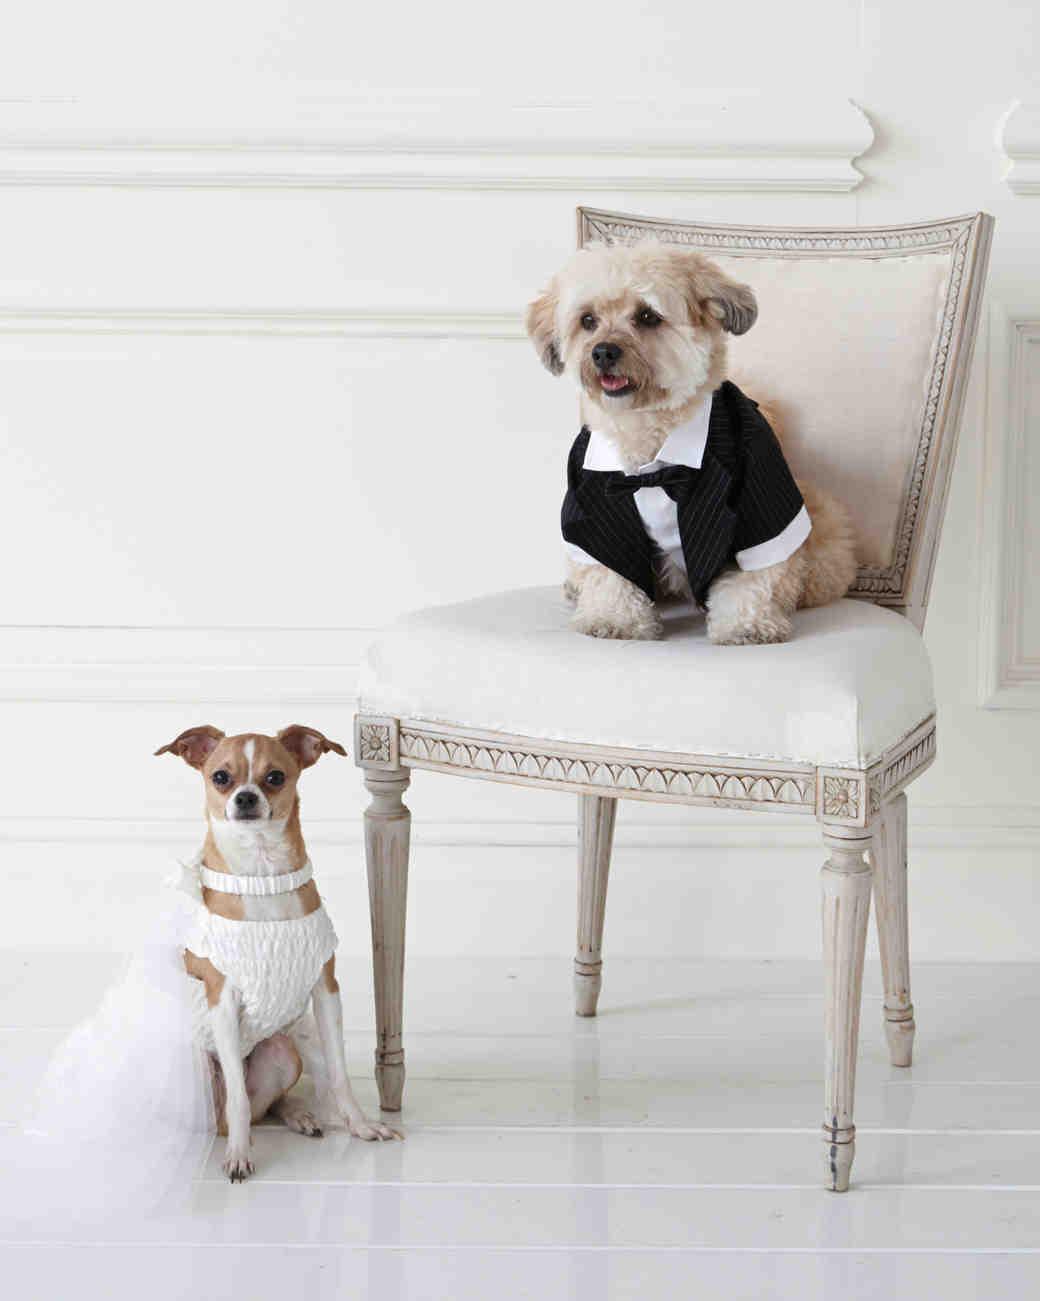 wedding-pet-clothes-mspets-wedding-bride-and-groom2-0515.jpg